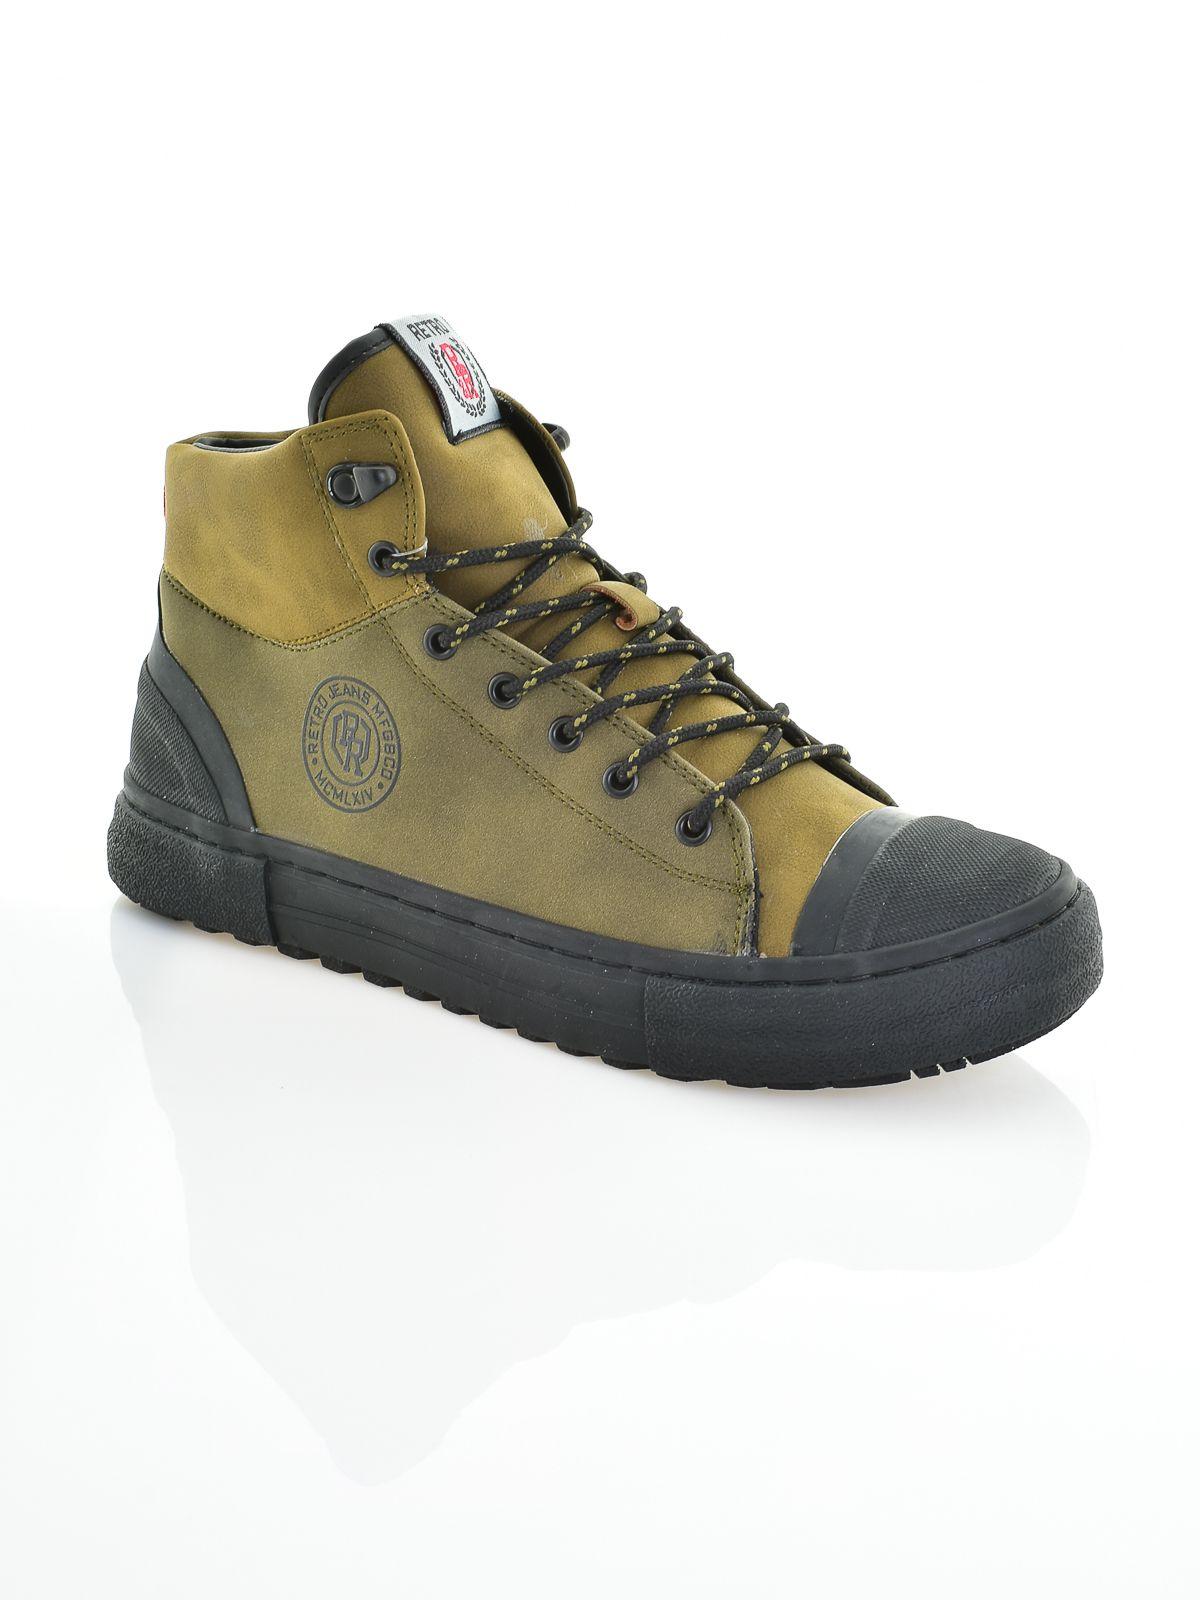 Pepe Jeans - Férfi - Cipő - Utcai cipő 46 2 3  a9b3ccf8c4